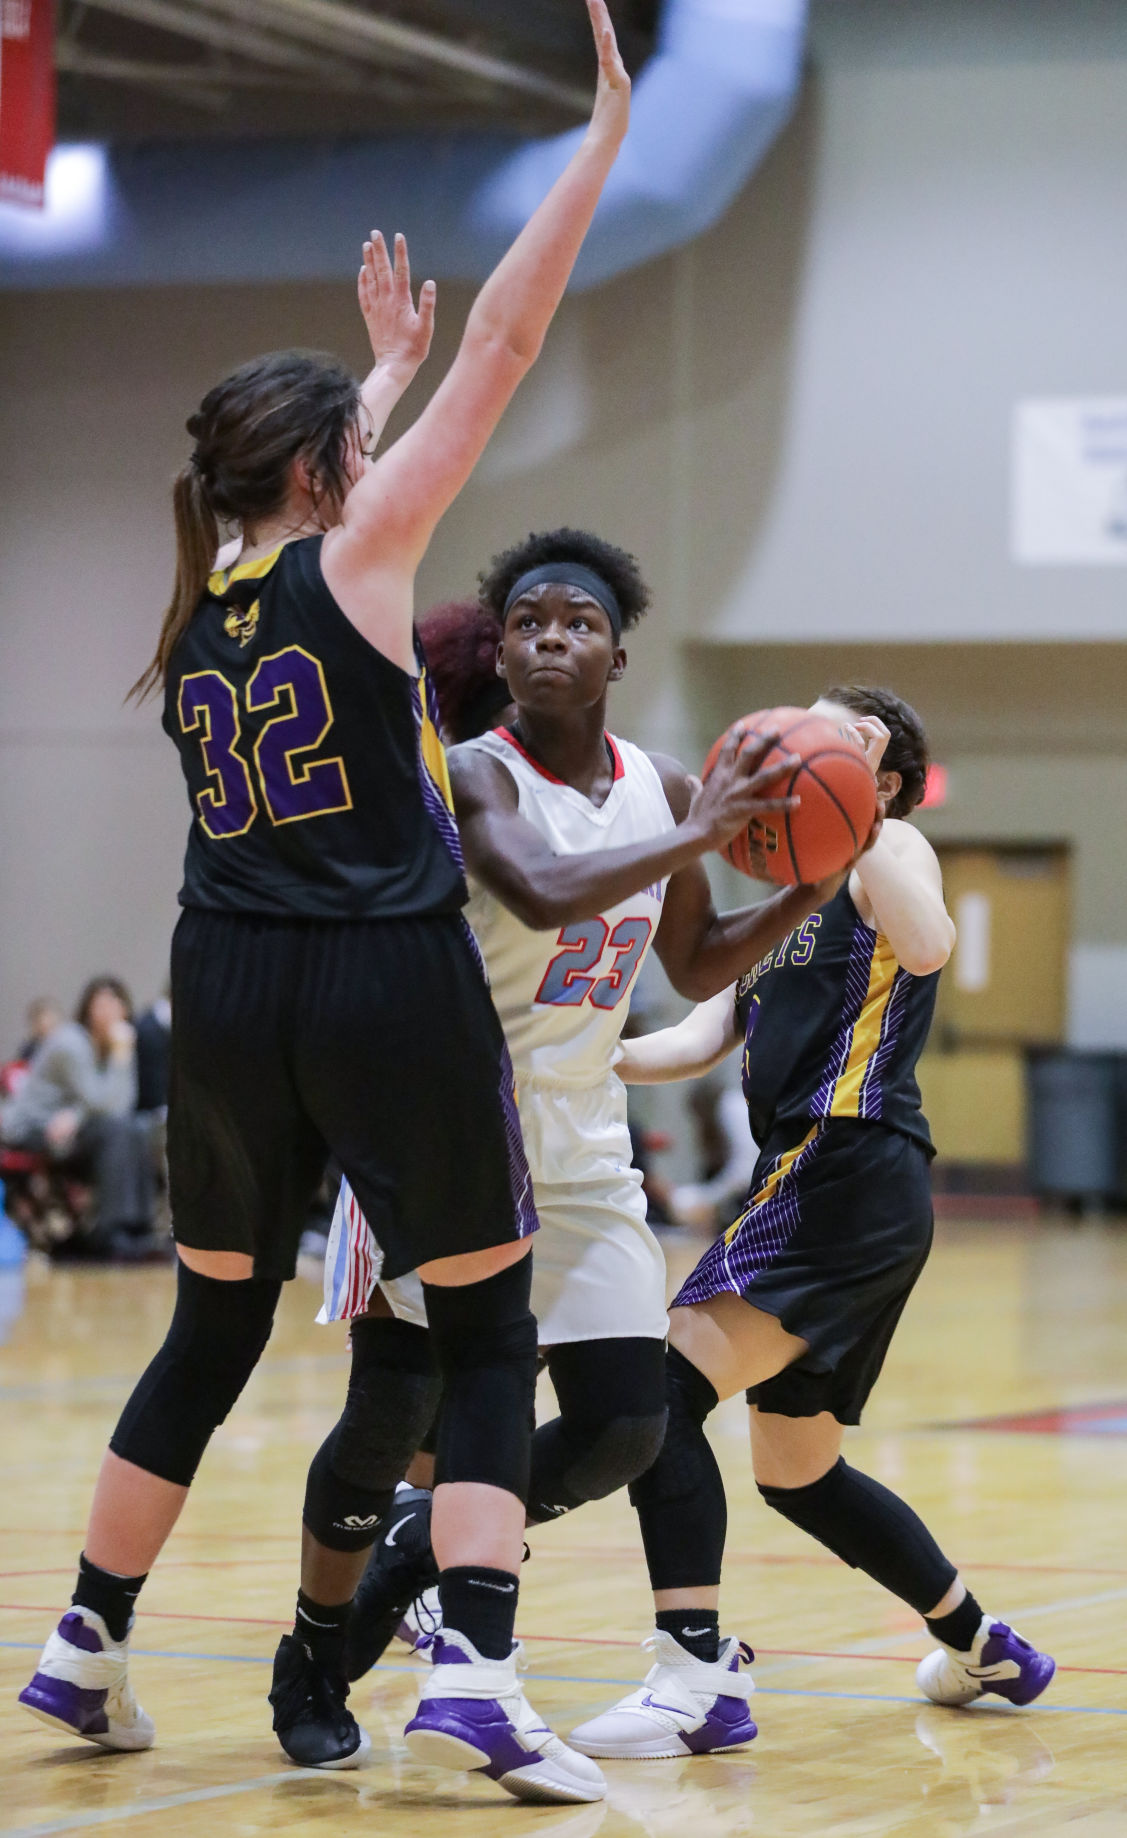 DSHS at Zachary girls basketball Osha Cummings Kate Thompson